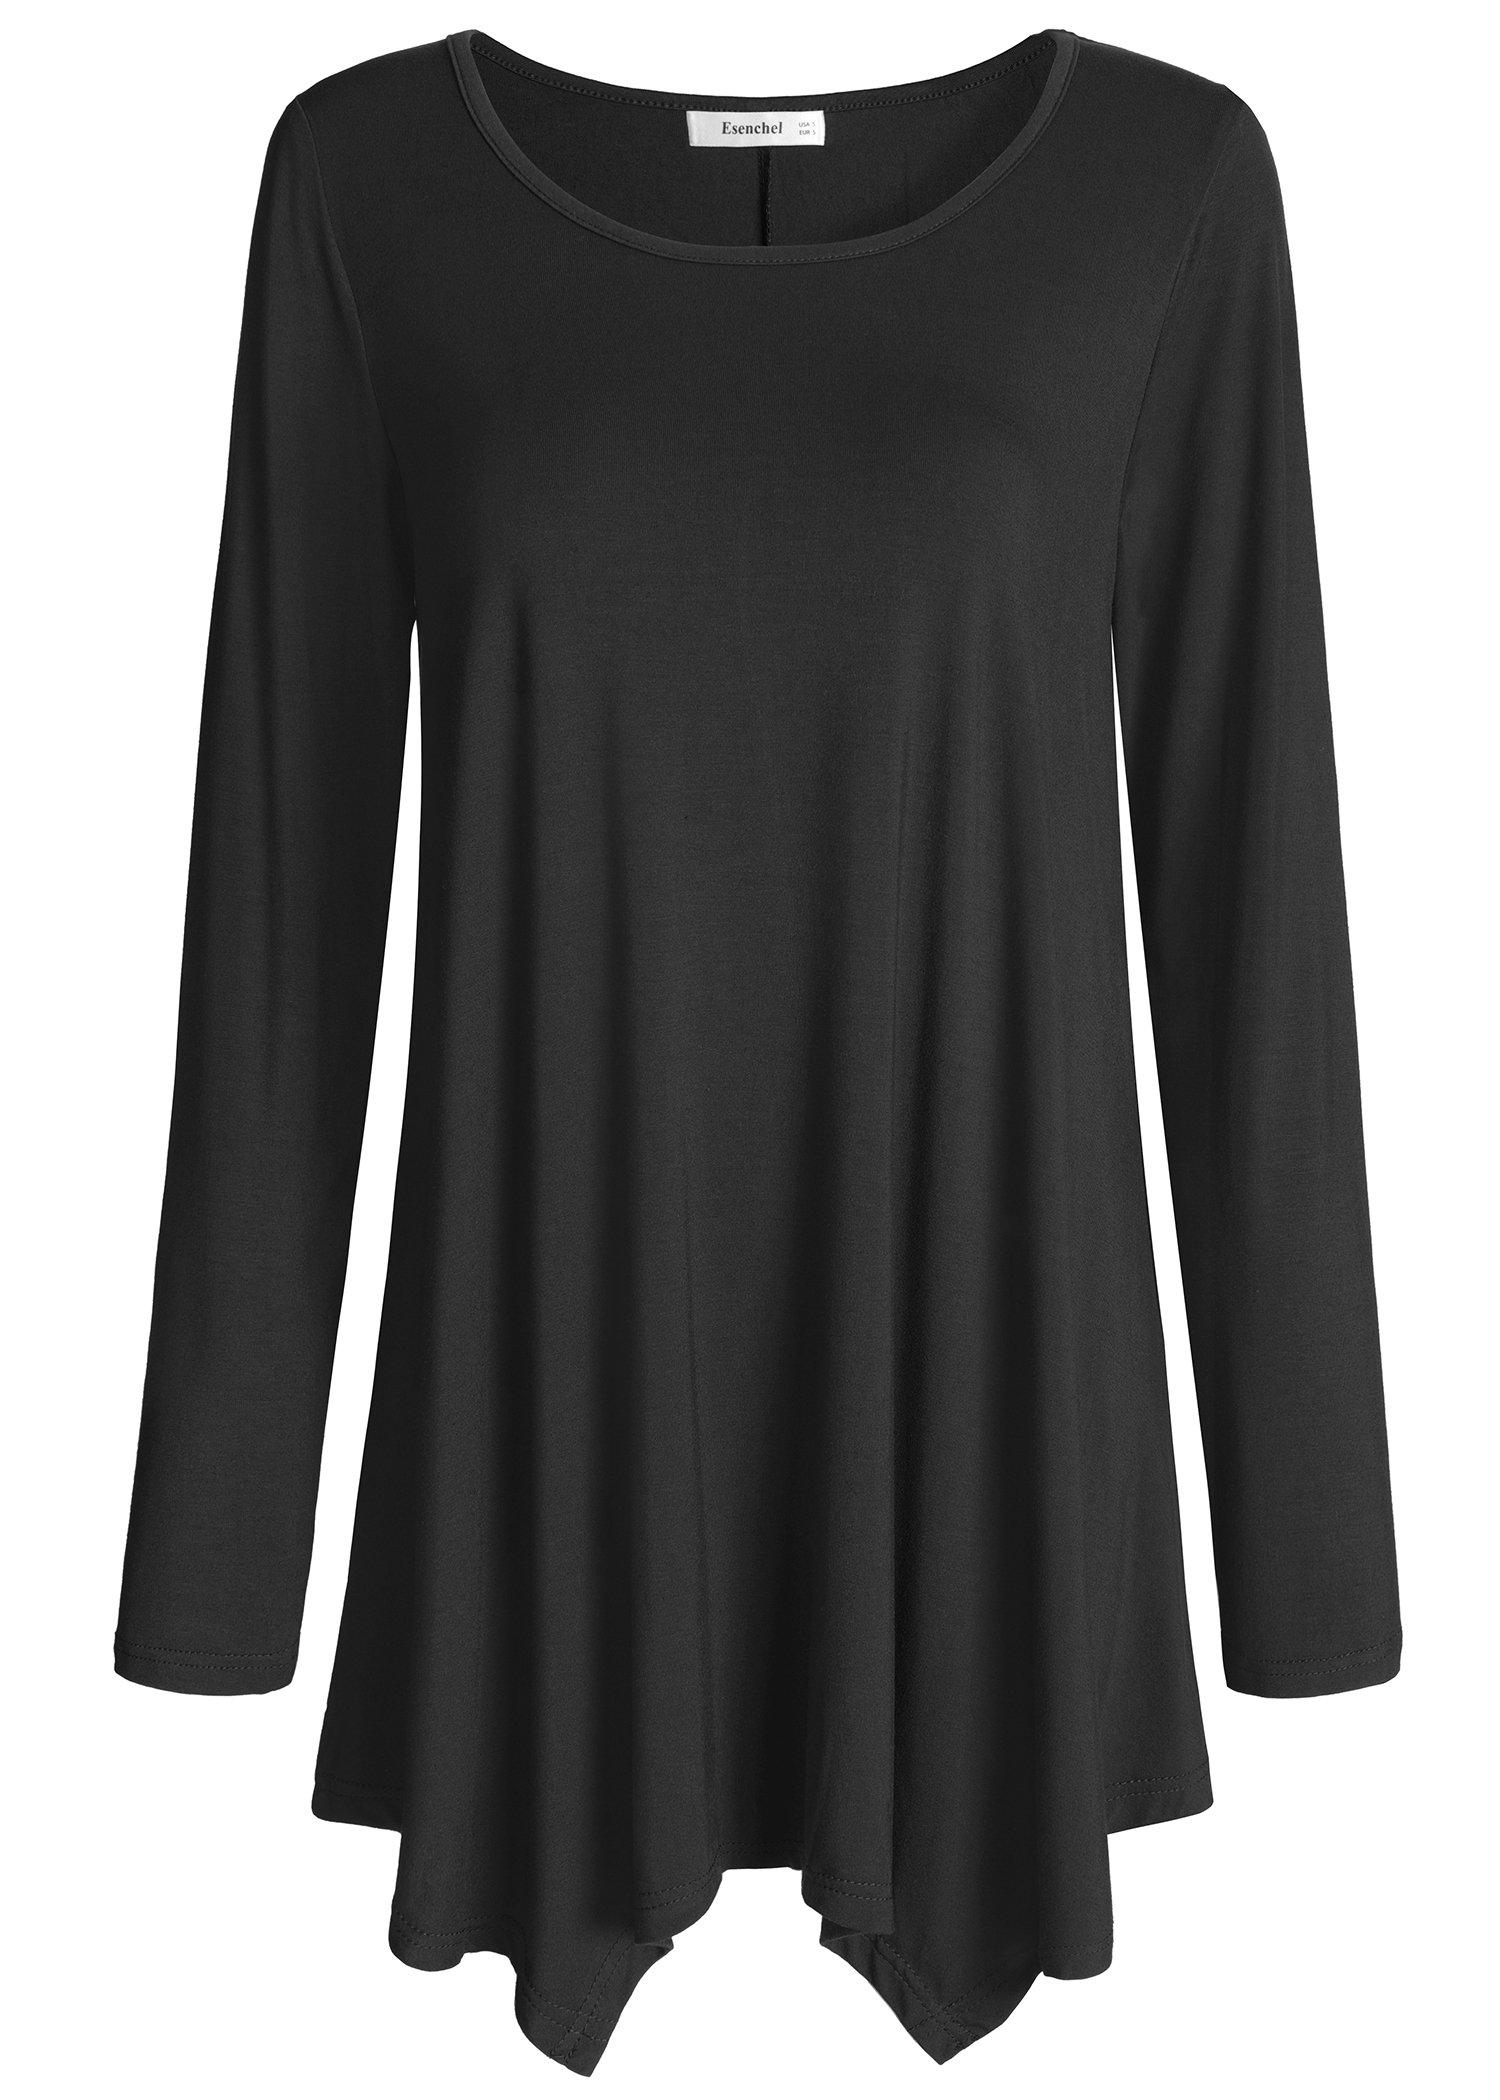 Esenchel Women's Long Sleeve Tunic Top for Leggings Flared Shirt XL Black